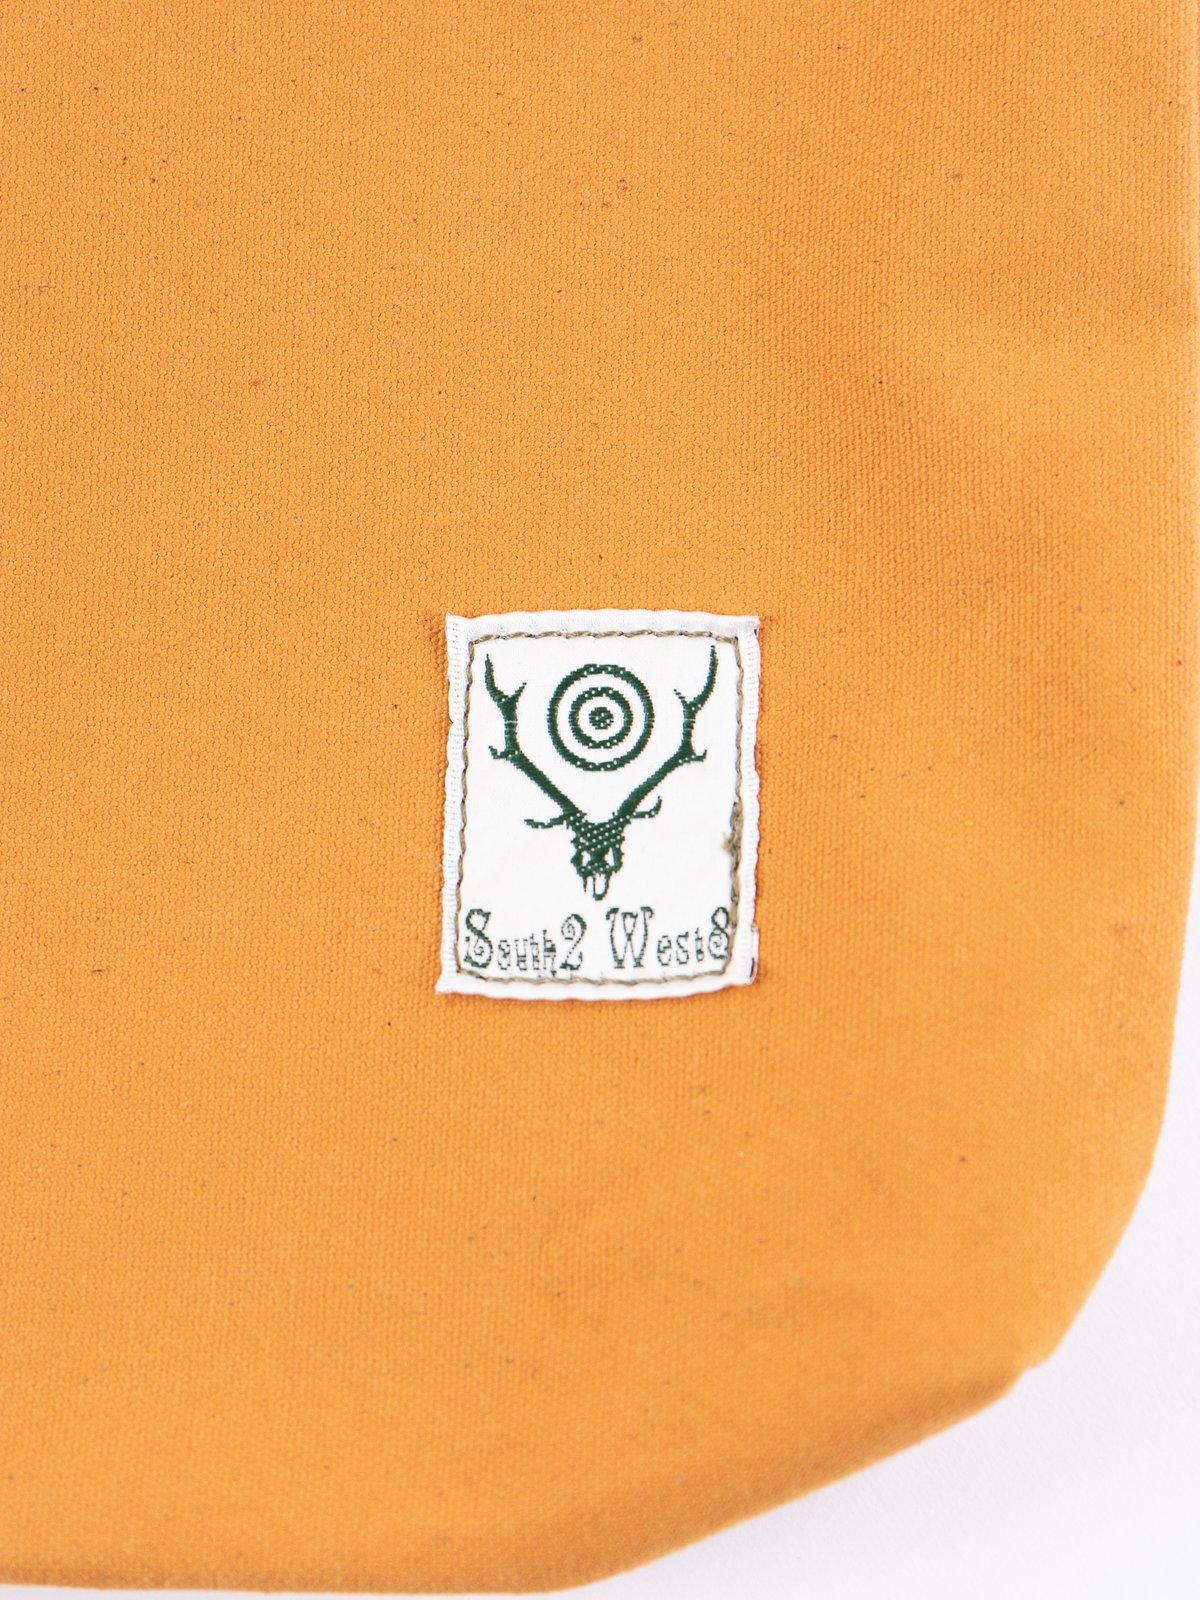 Suntan Sunforger Book Pack - Image 2